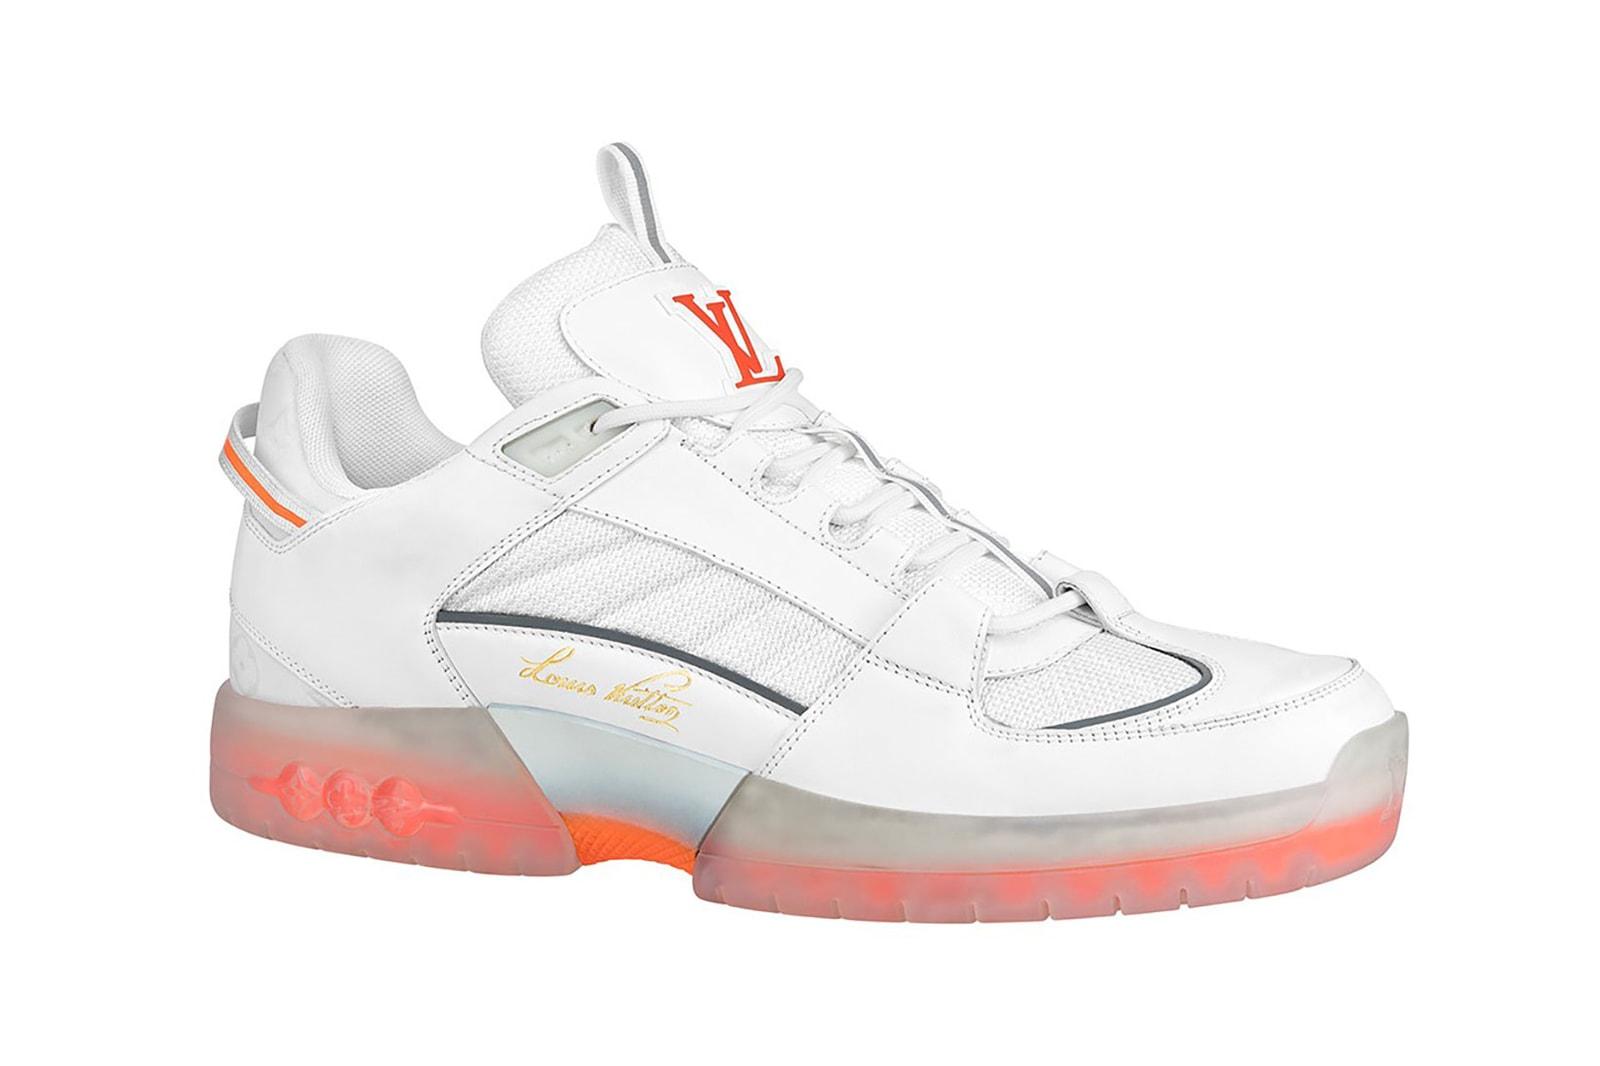 louis vuitton pre spring 2021 a view skate sneakers white orange blue sneakerhead footwear shoes